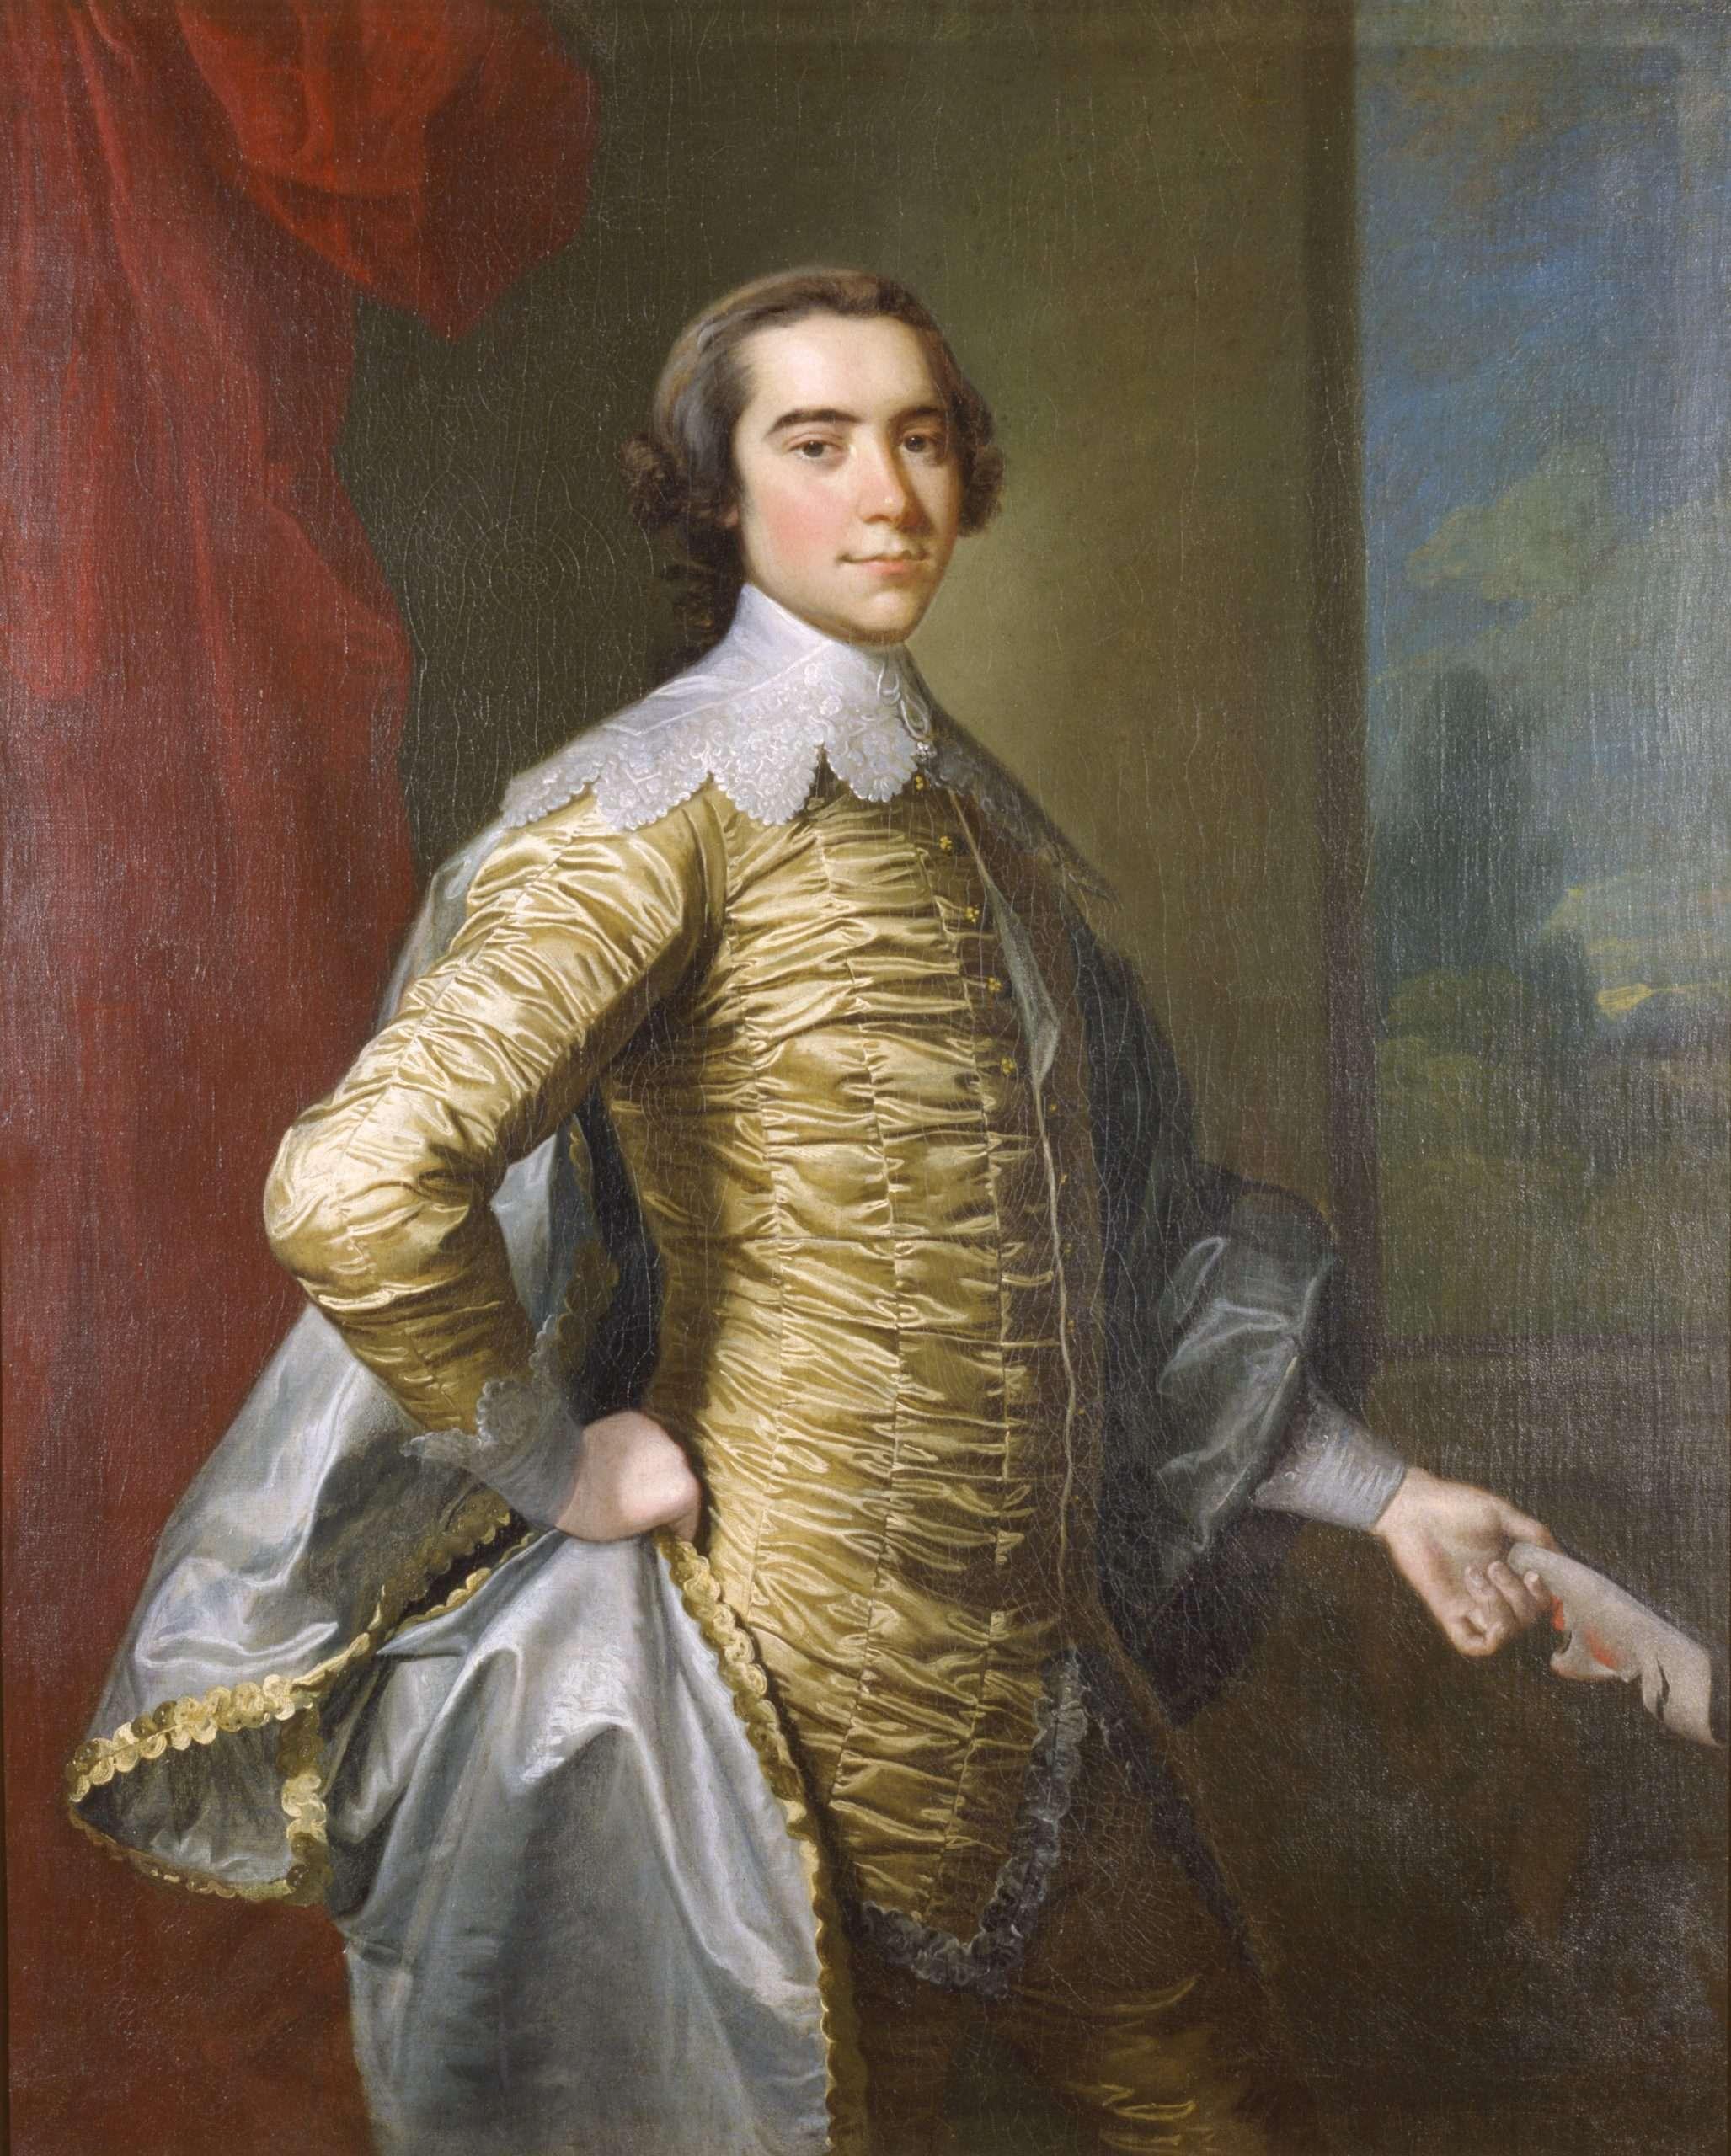 Robert Carter III